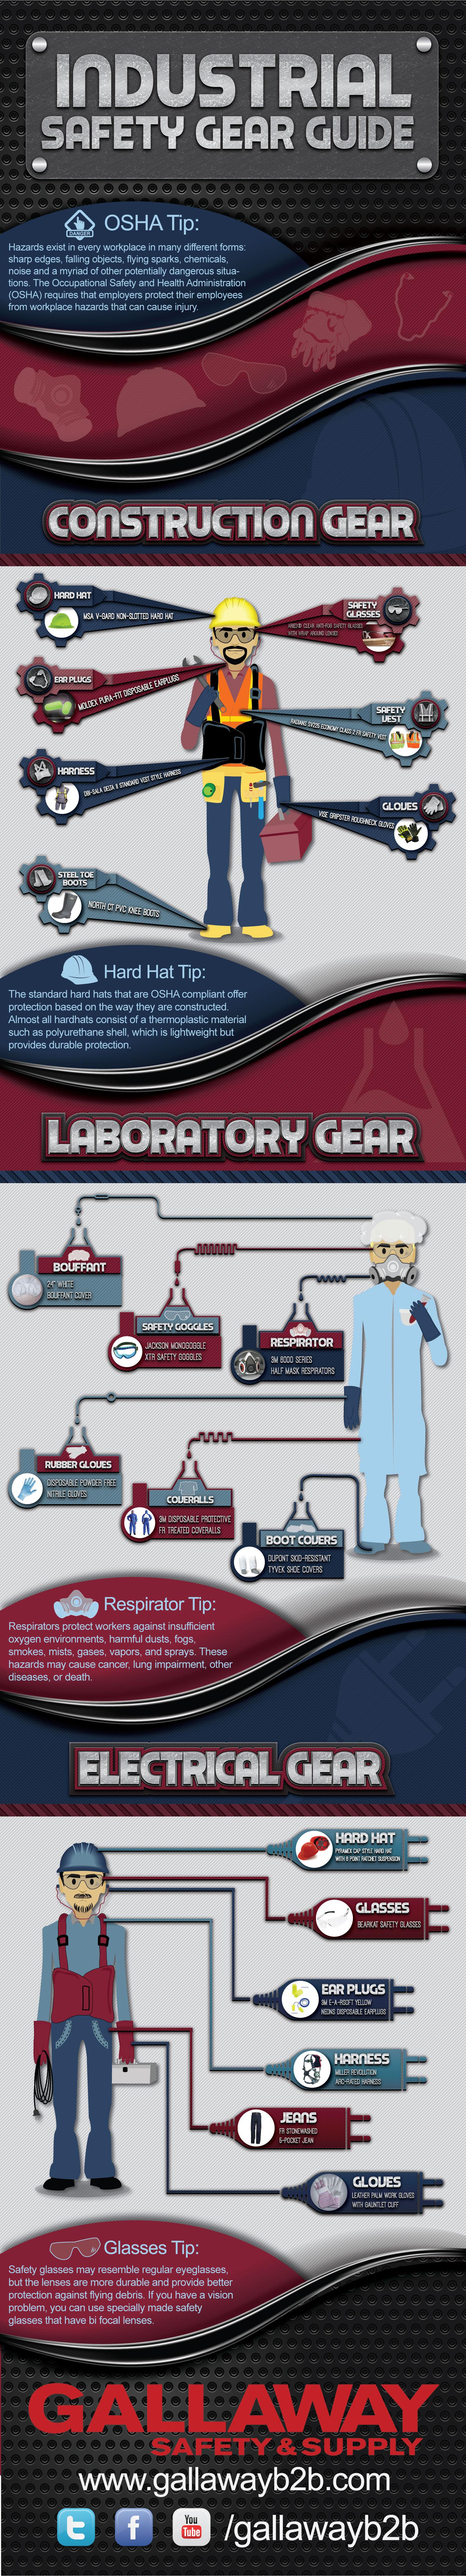 industrial-safety-gear-guide_525f8546b88b8